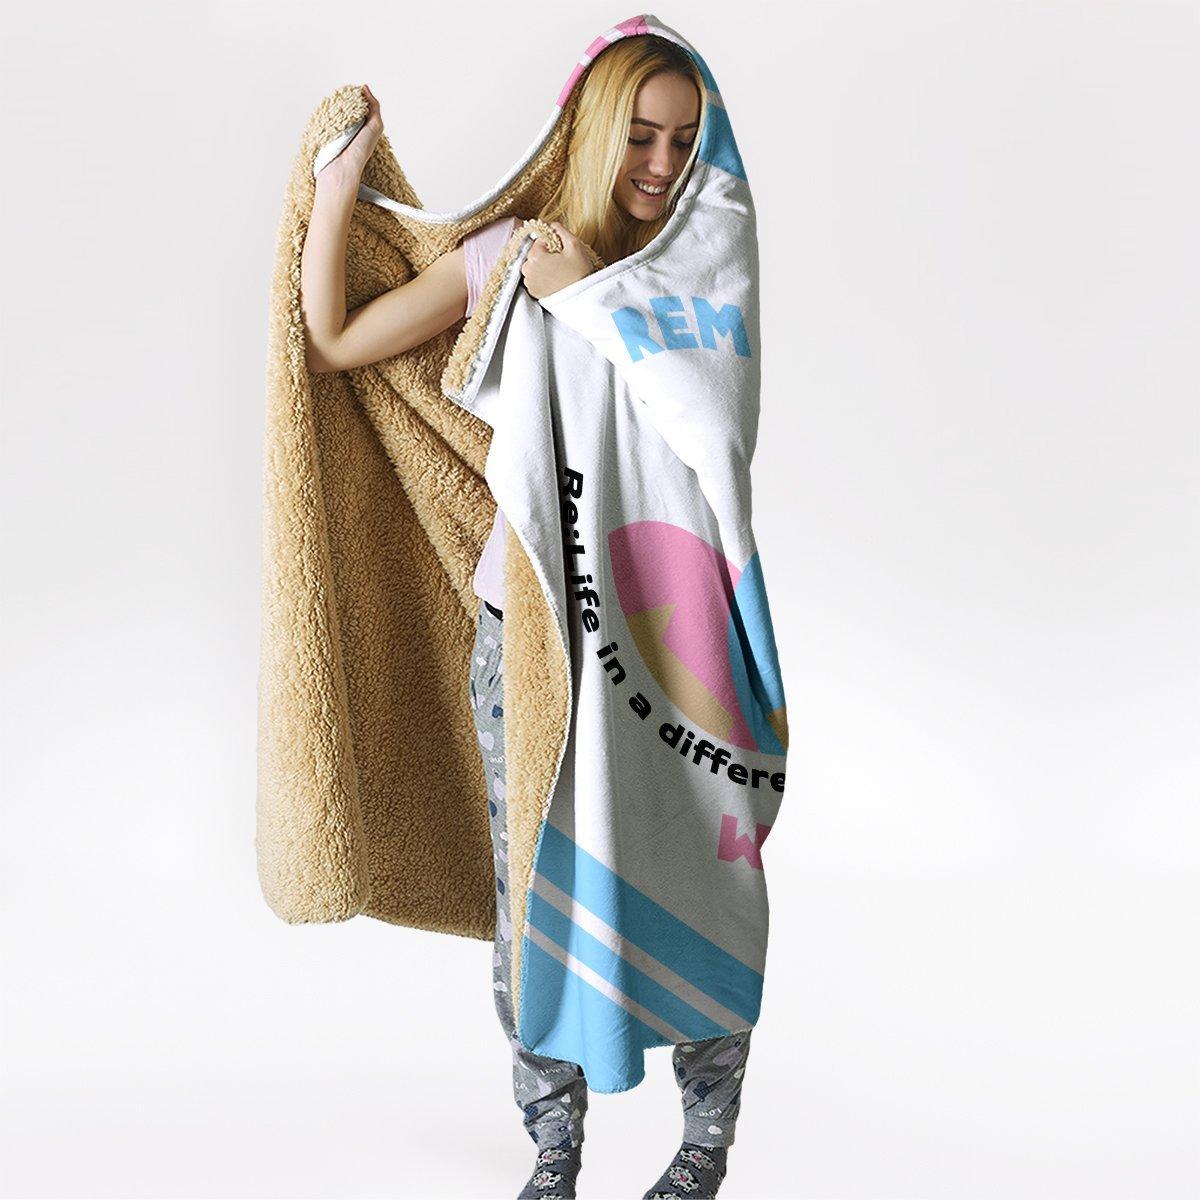 re zero rem ram hooded blanket 384571 - Otaku Treat